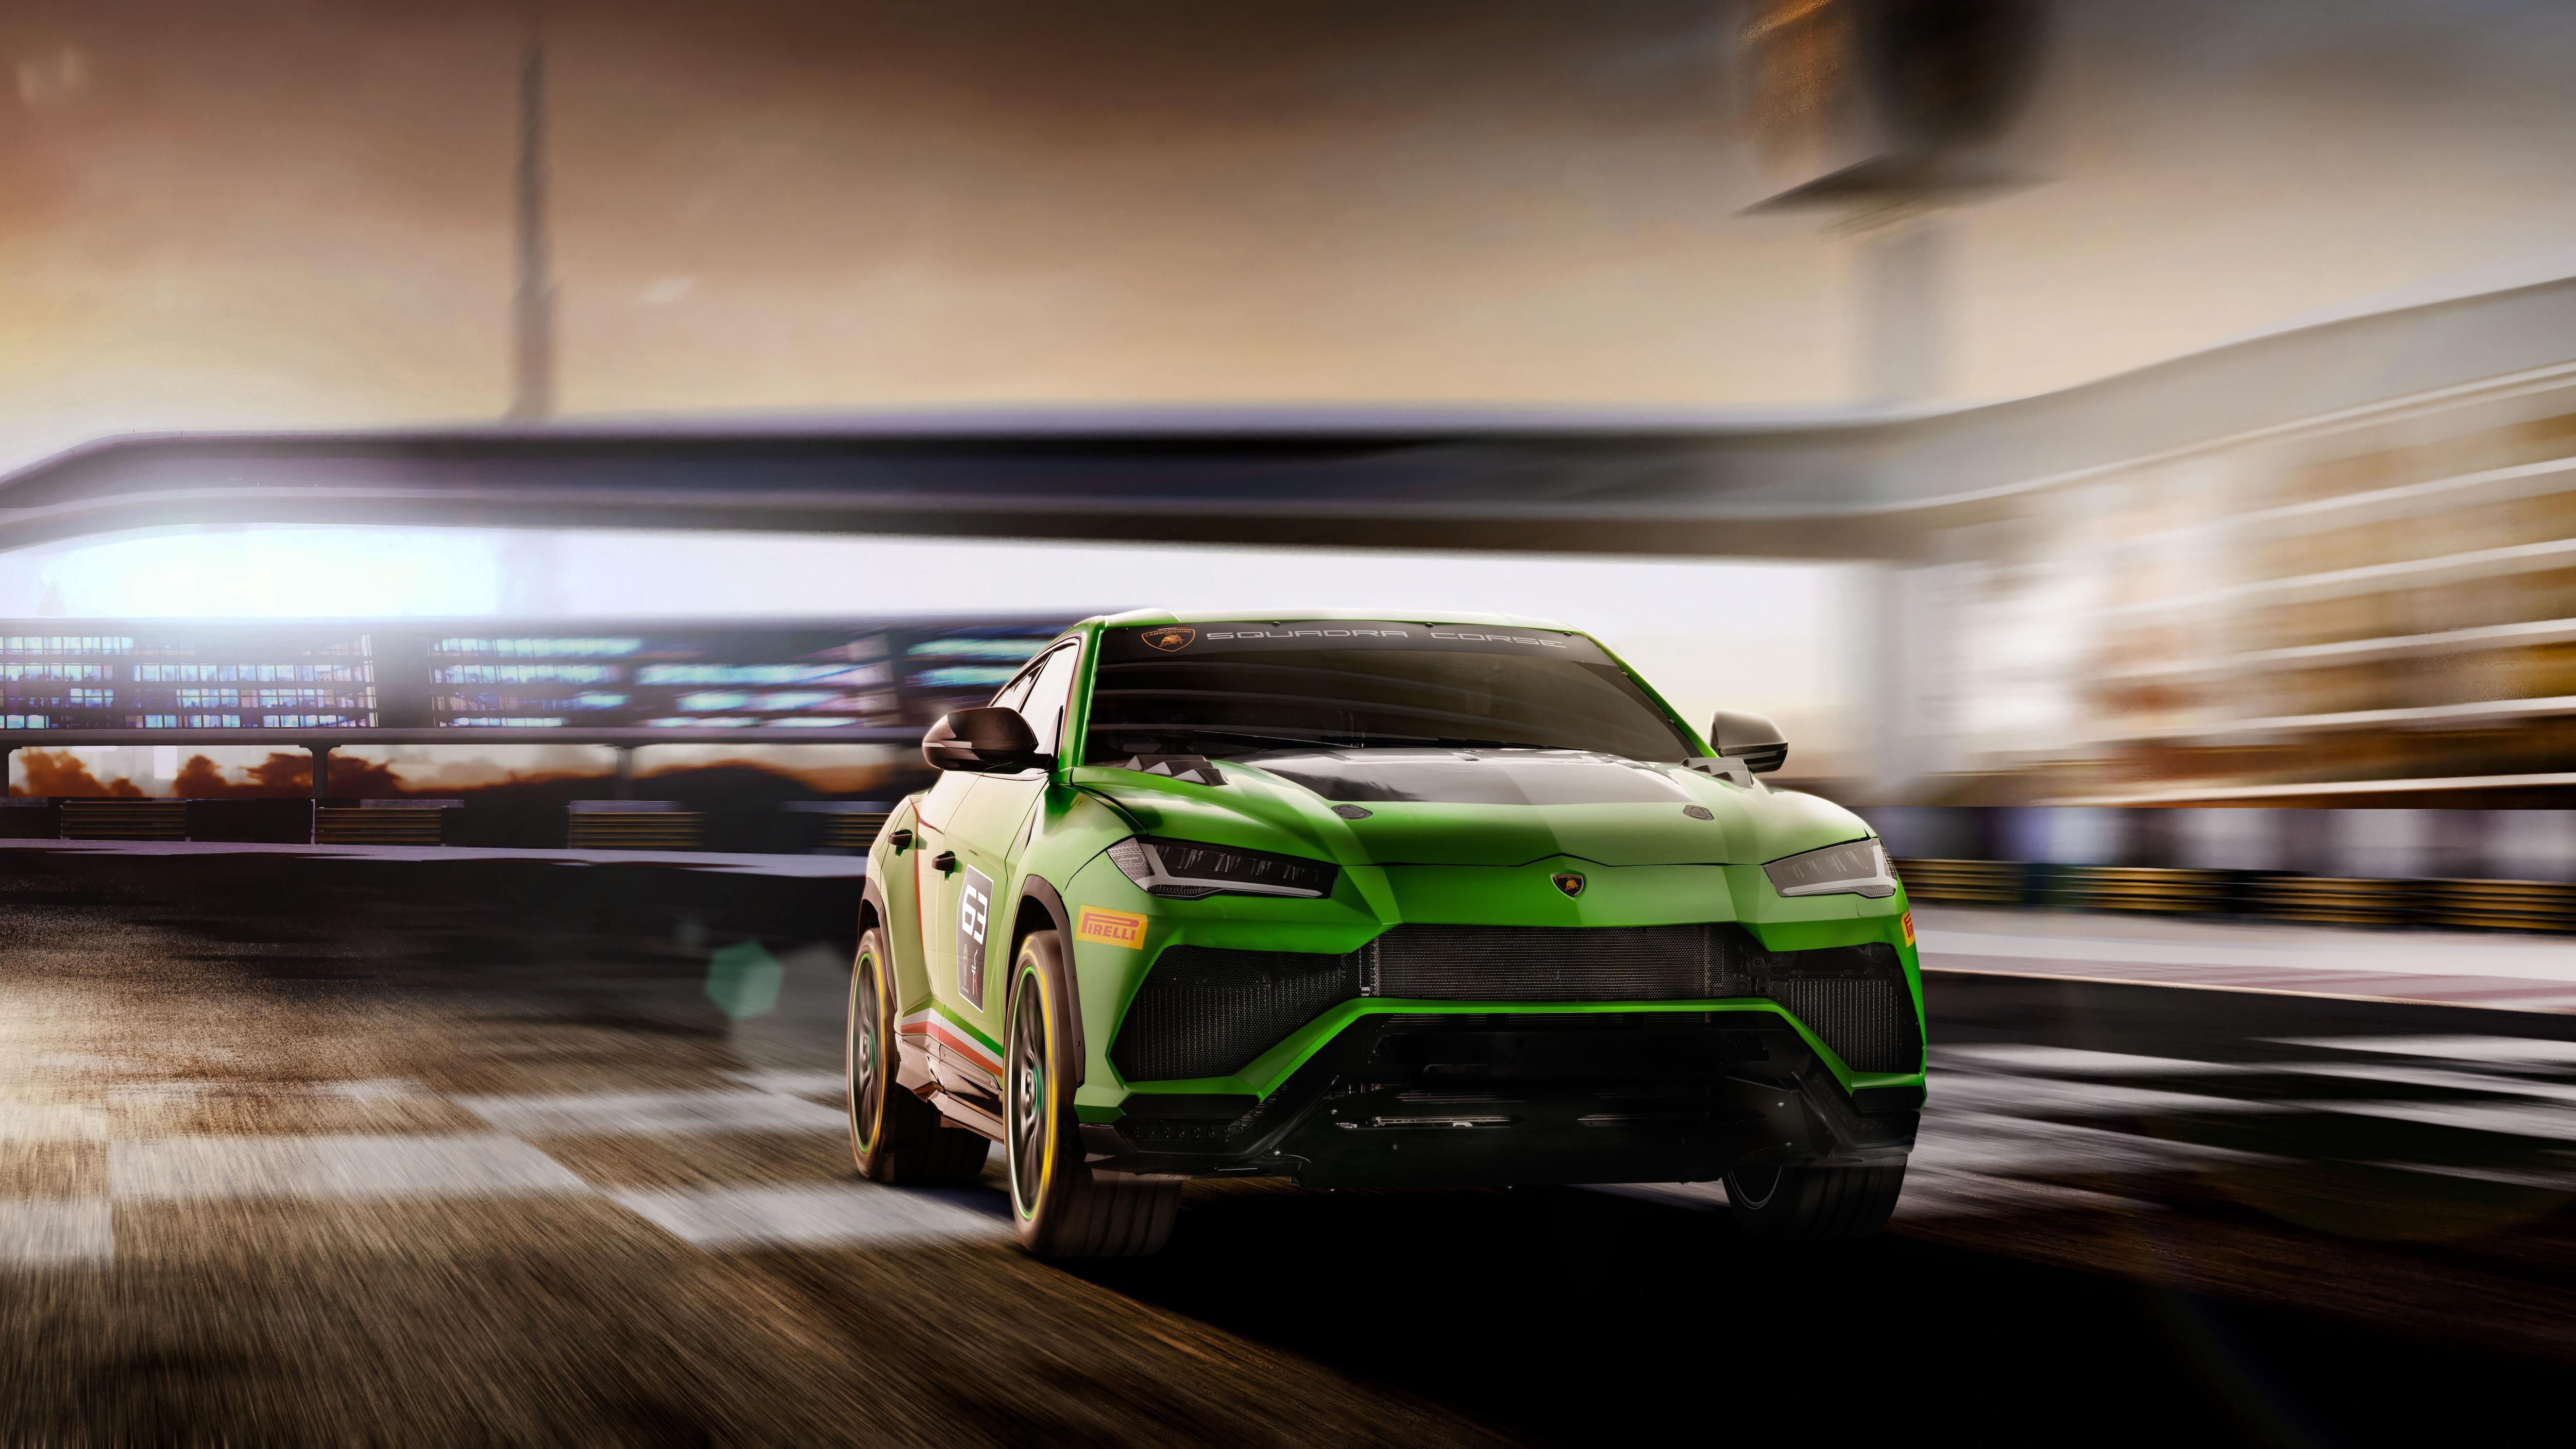 2020 Lamborghini Urus St X Concept Is A Track Ready Beast